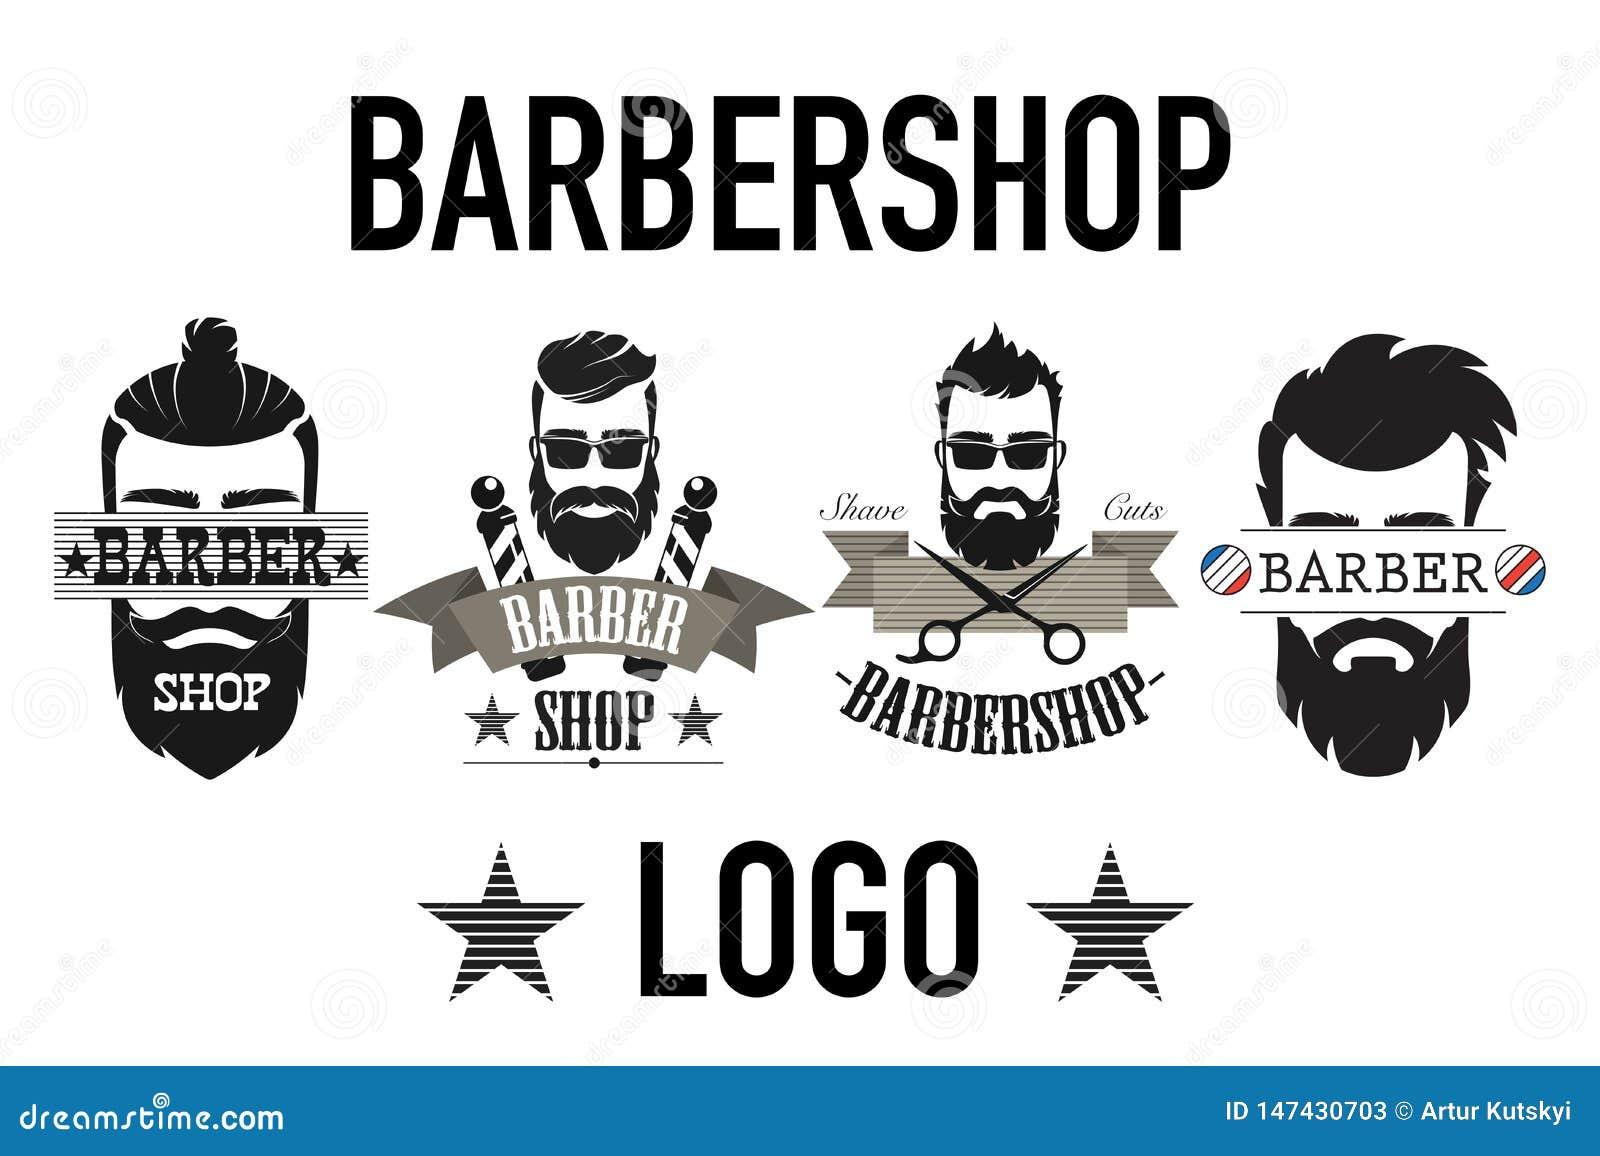 Vintage retro barbershop logo, label, emblem and badgesisolated on white vector illustration.